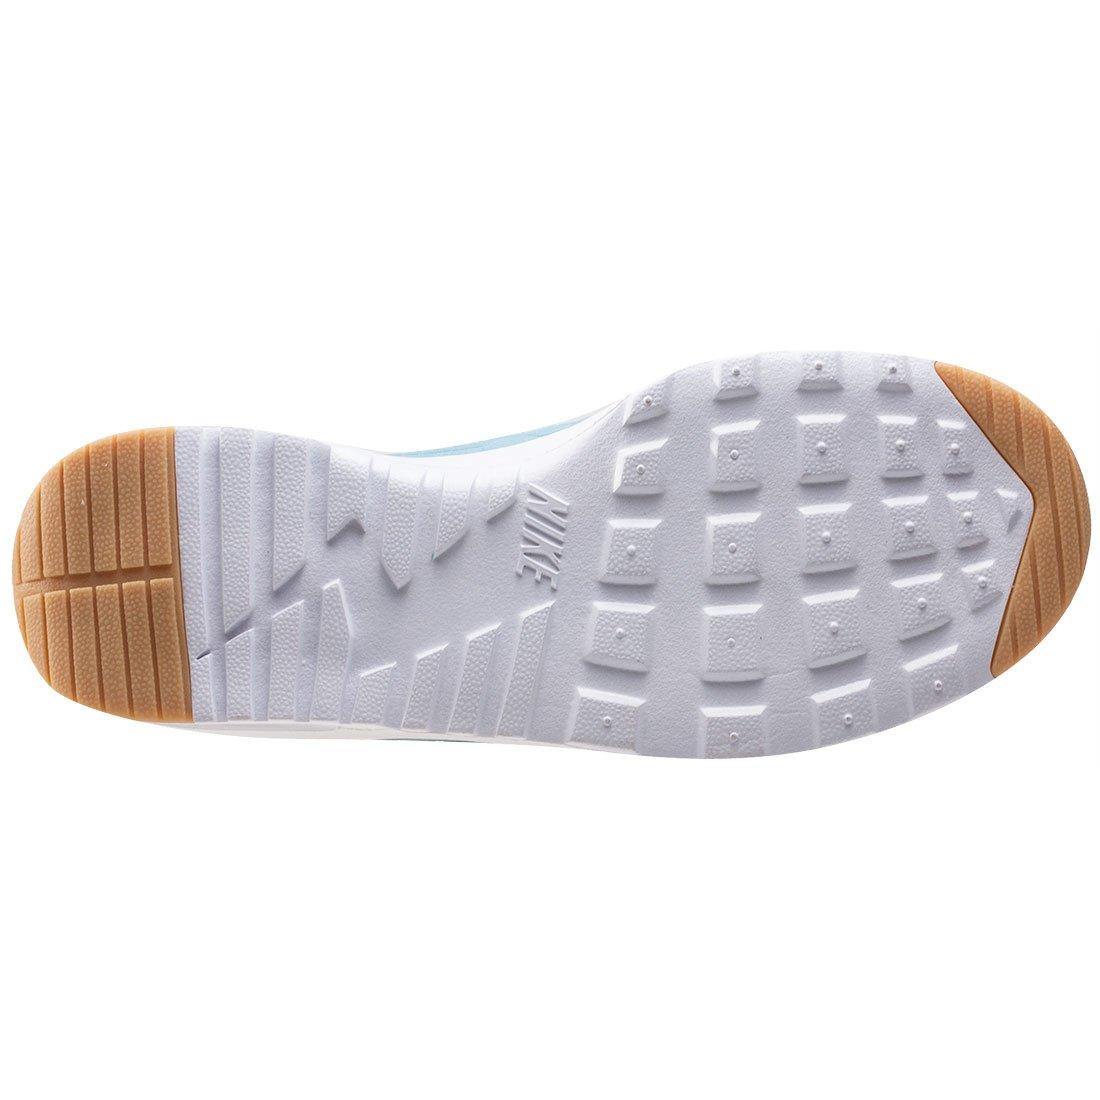 Nike Damen Damen Damen Air Max Thea PRM Gymnastikschuhe  238654